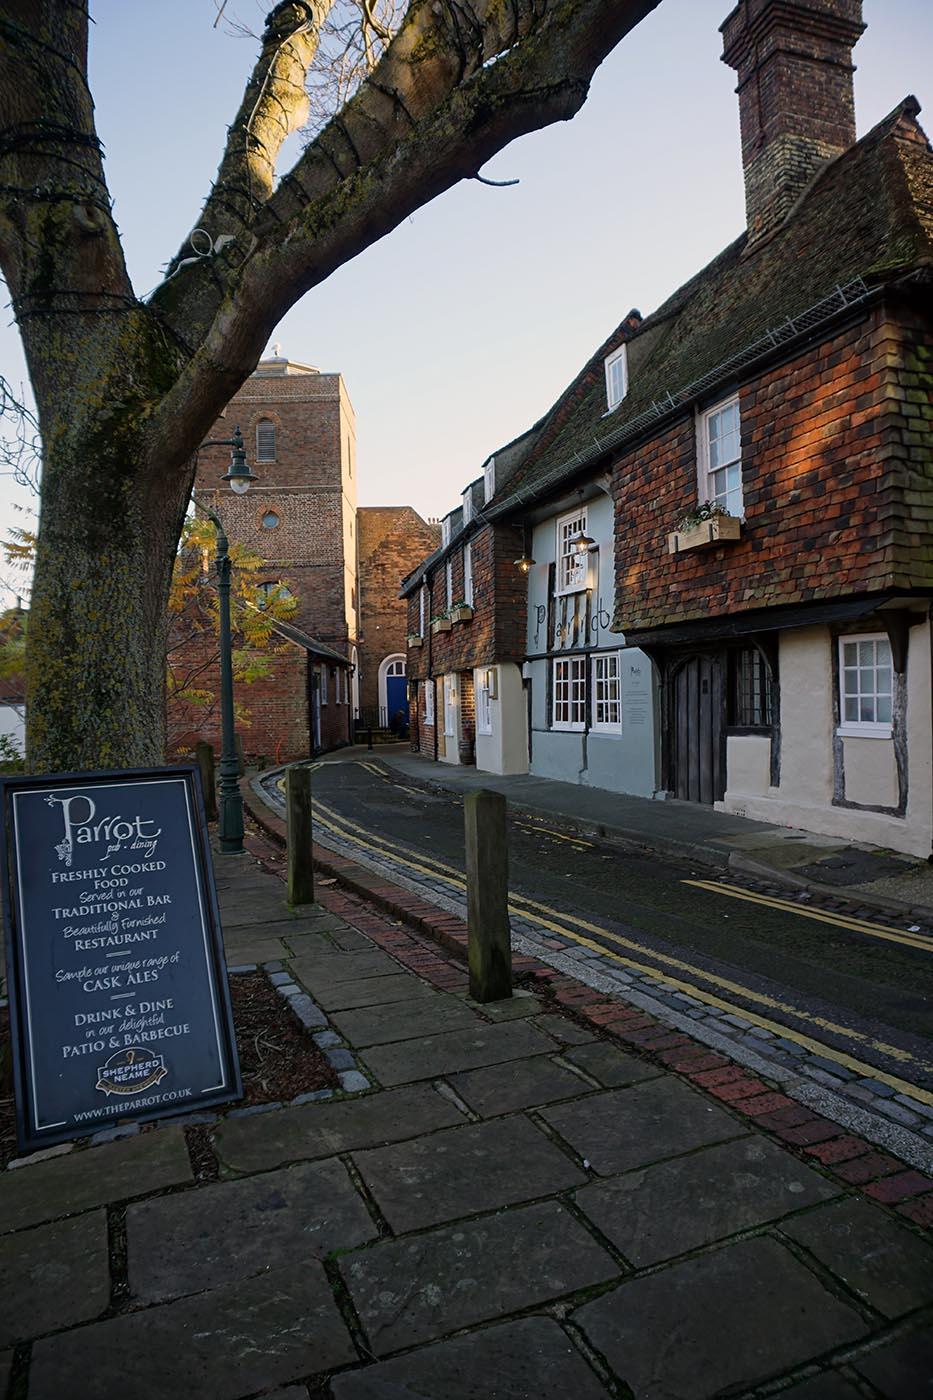 The Parrot Pub, Canterbury